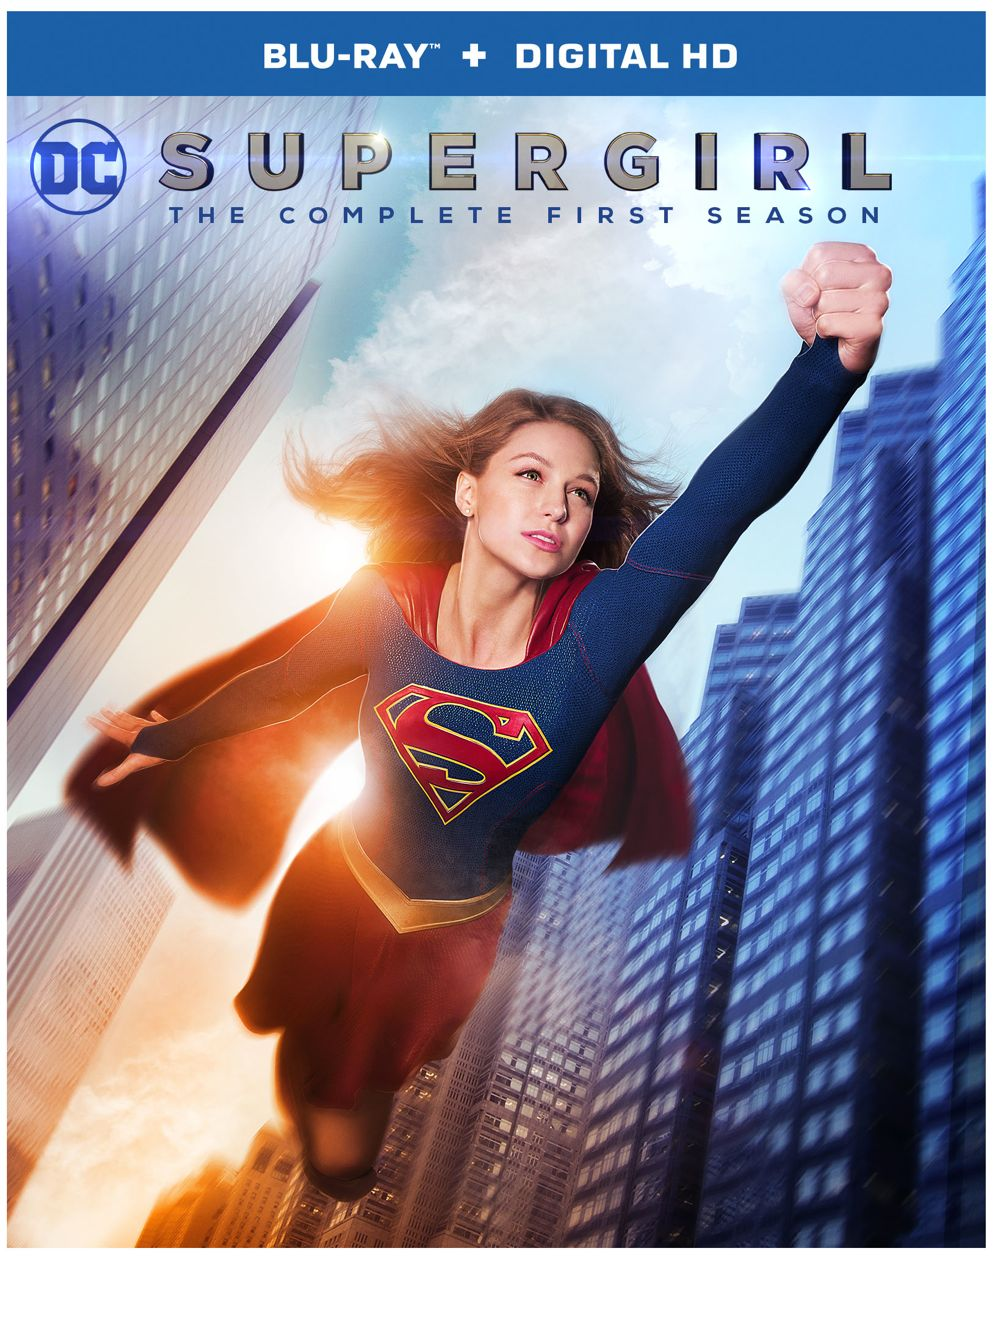 Supergirl Season 1 Bluray - 1